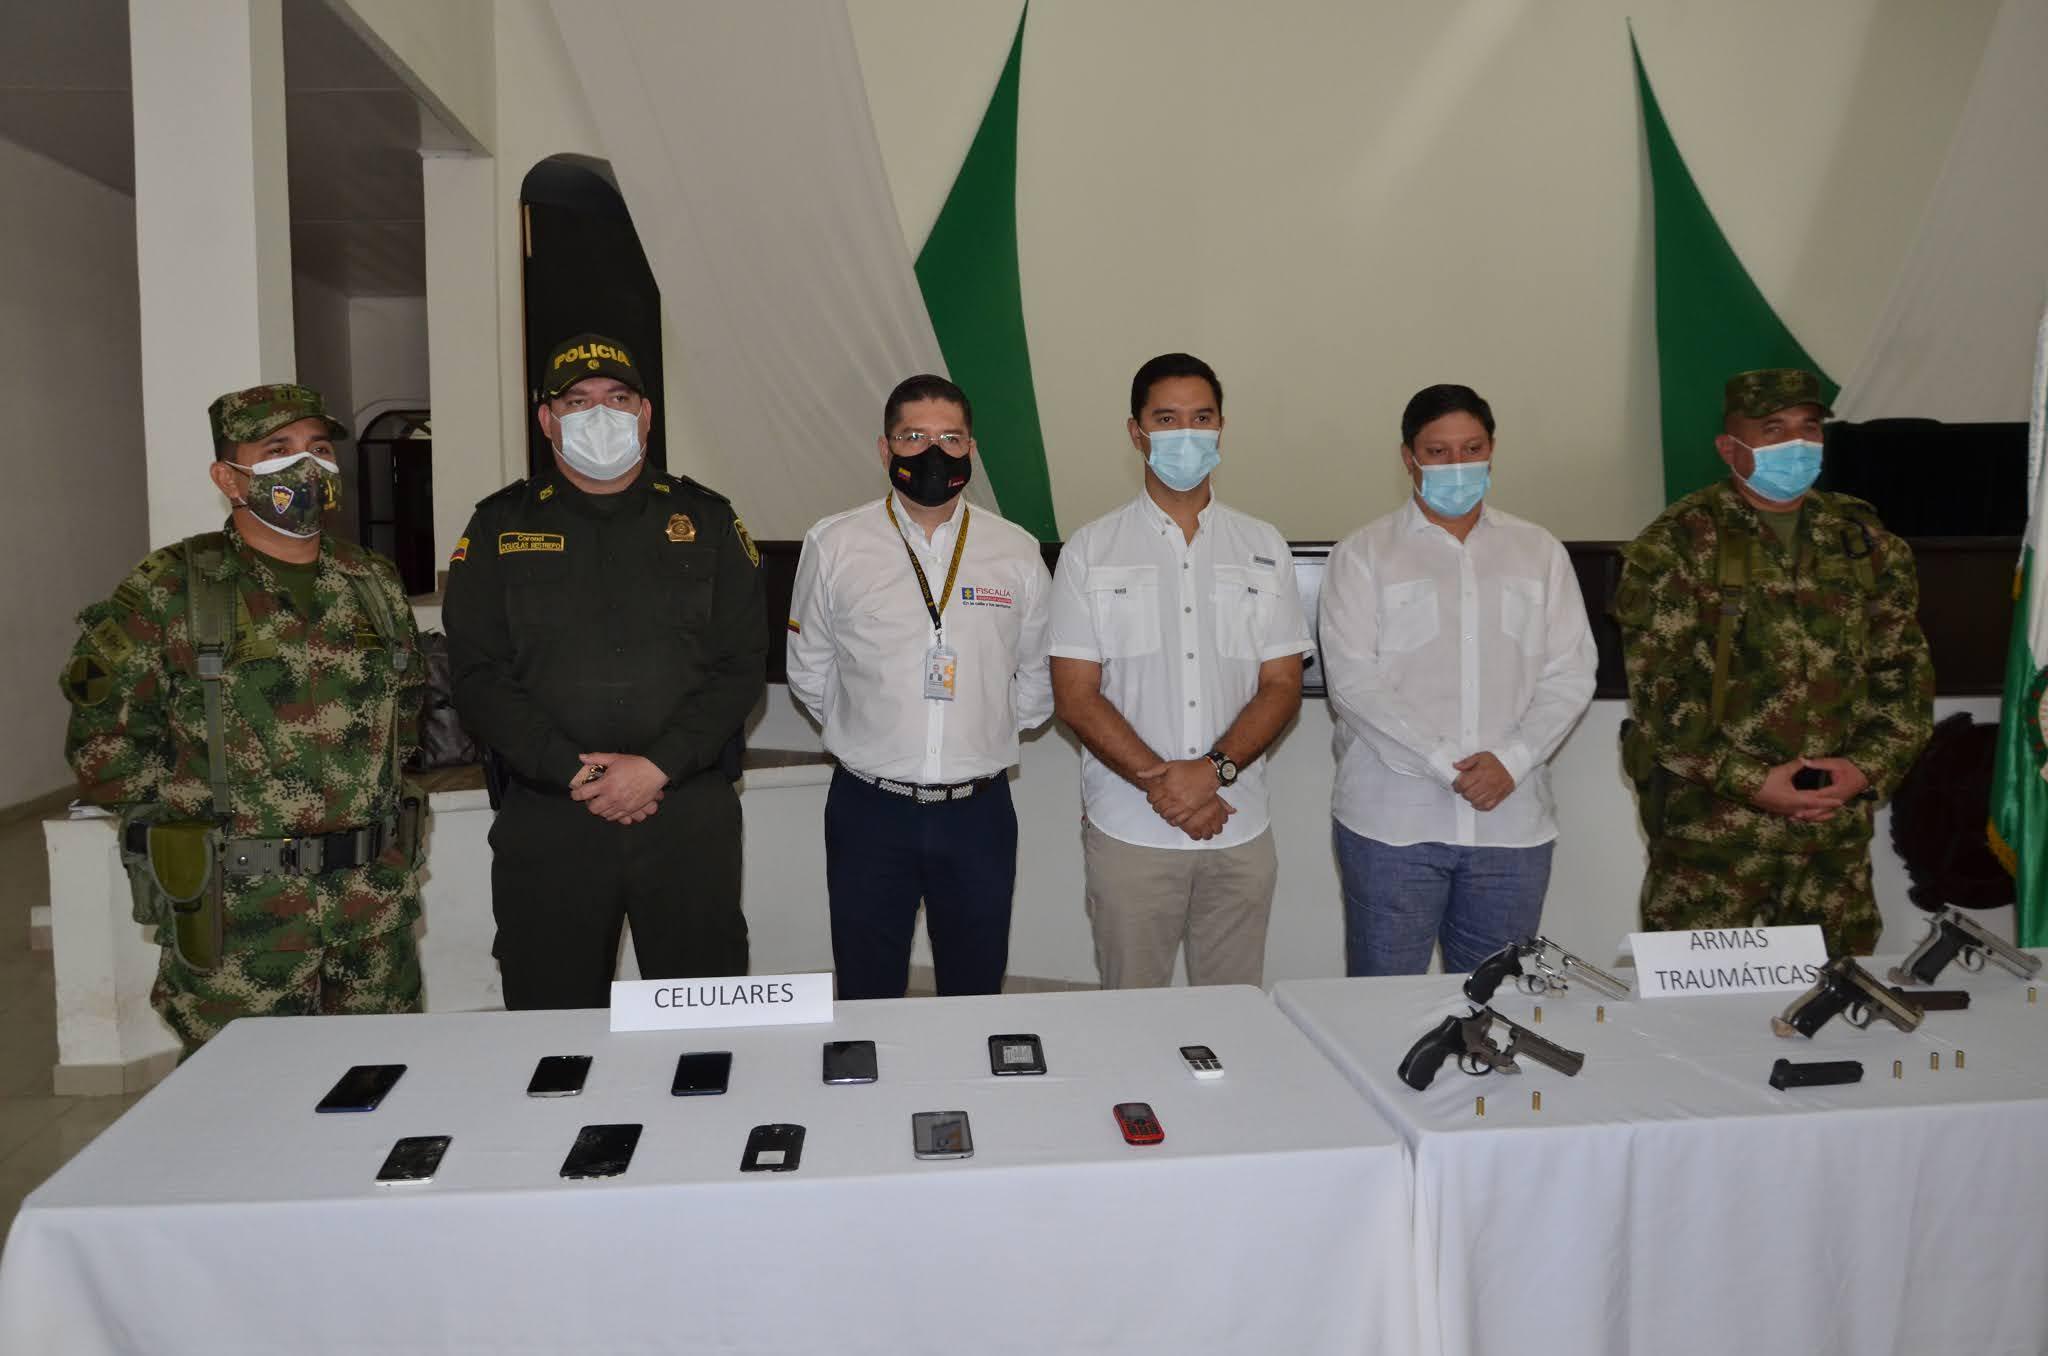 https://www.notasrosas.com/Policía Nacional entregó balance positivo del fin de semana en el Cesar